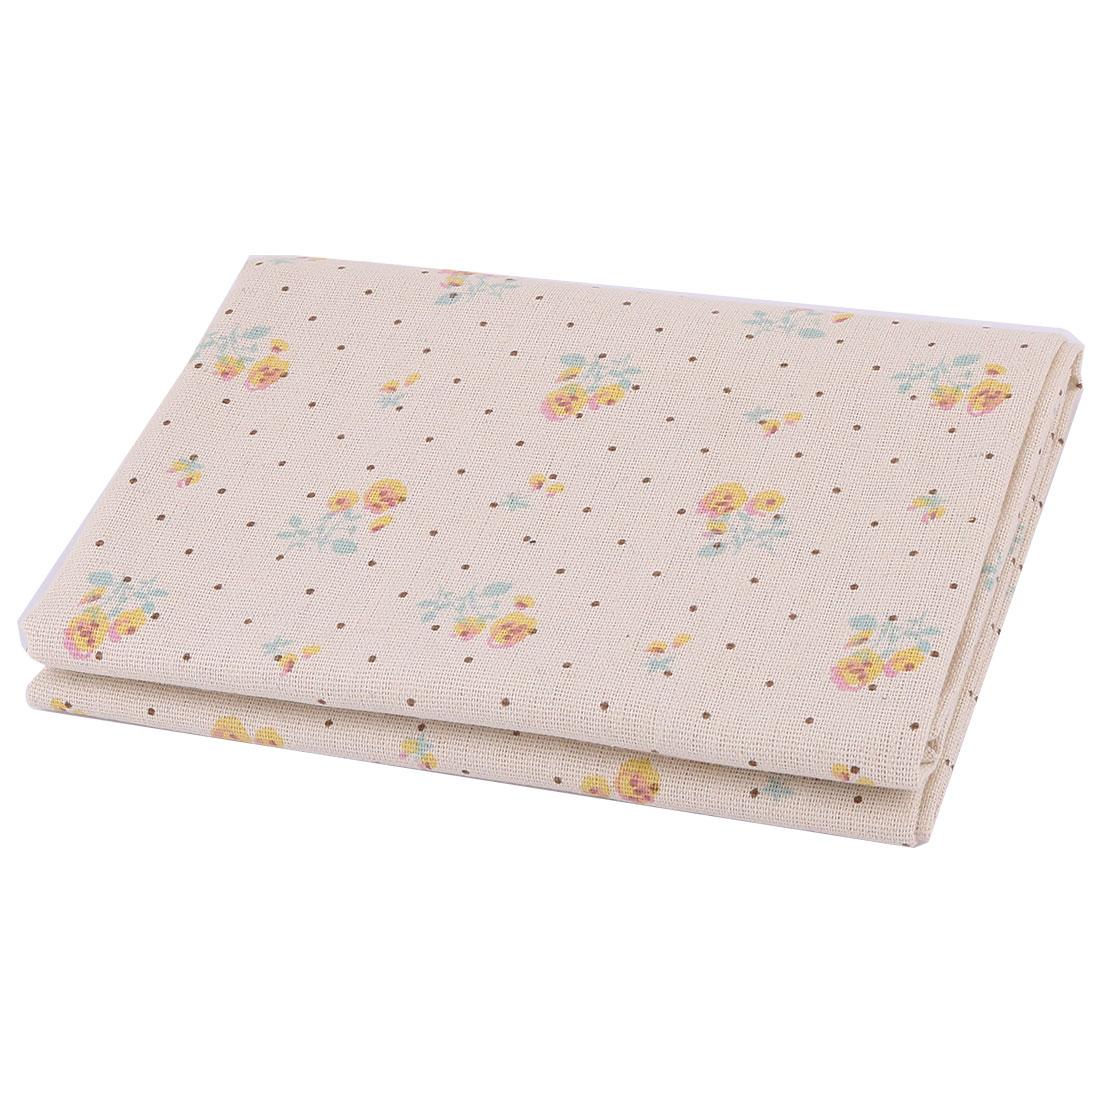 Unique BargainsHome Linen Flower Pattern Table Cover Curtain Handbag DIY Fabric 1.55M Length